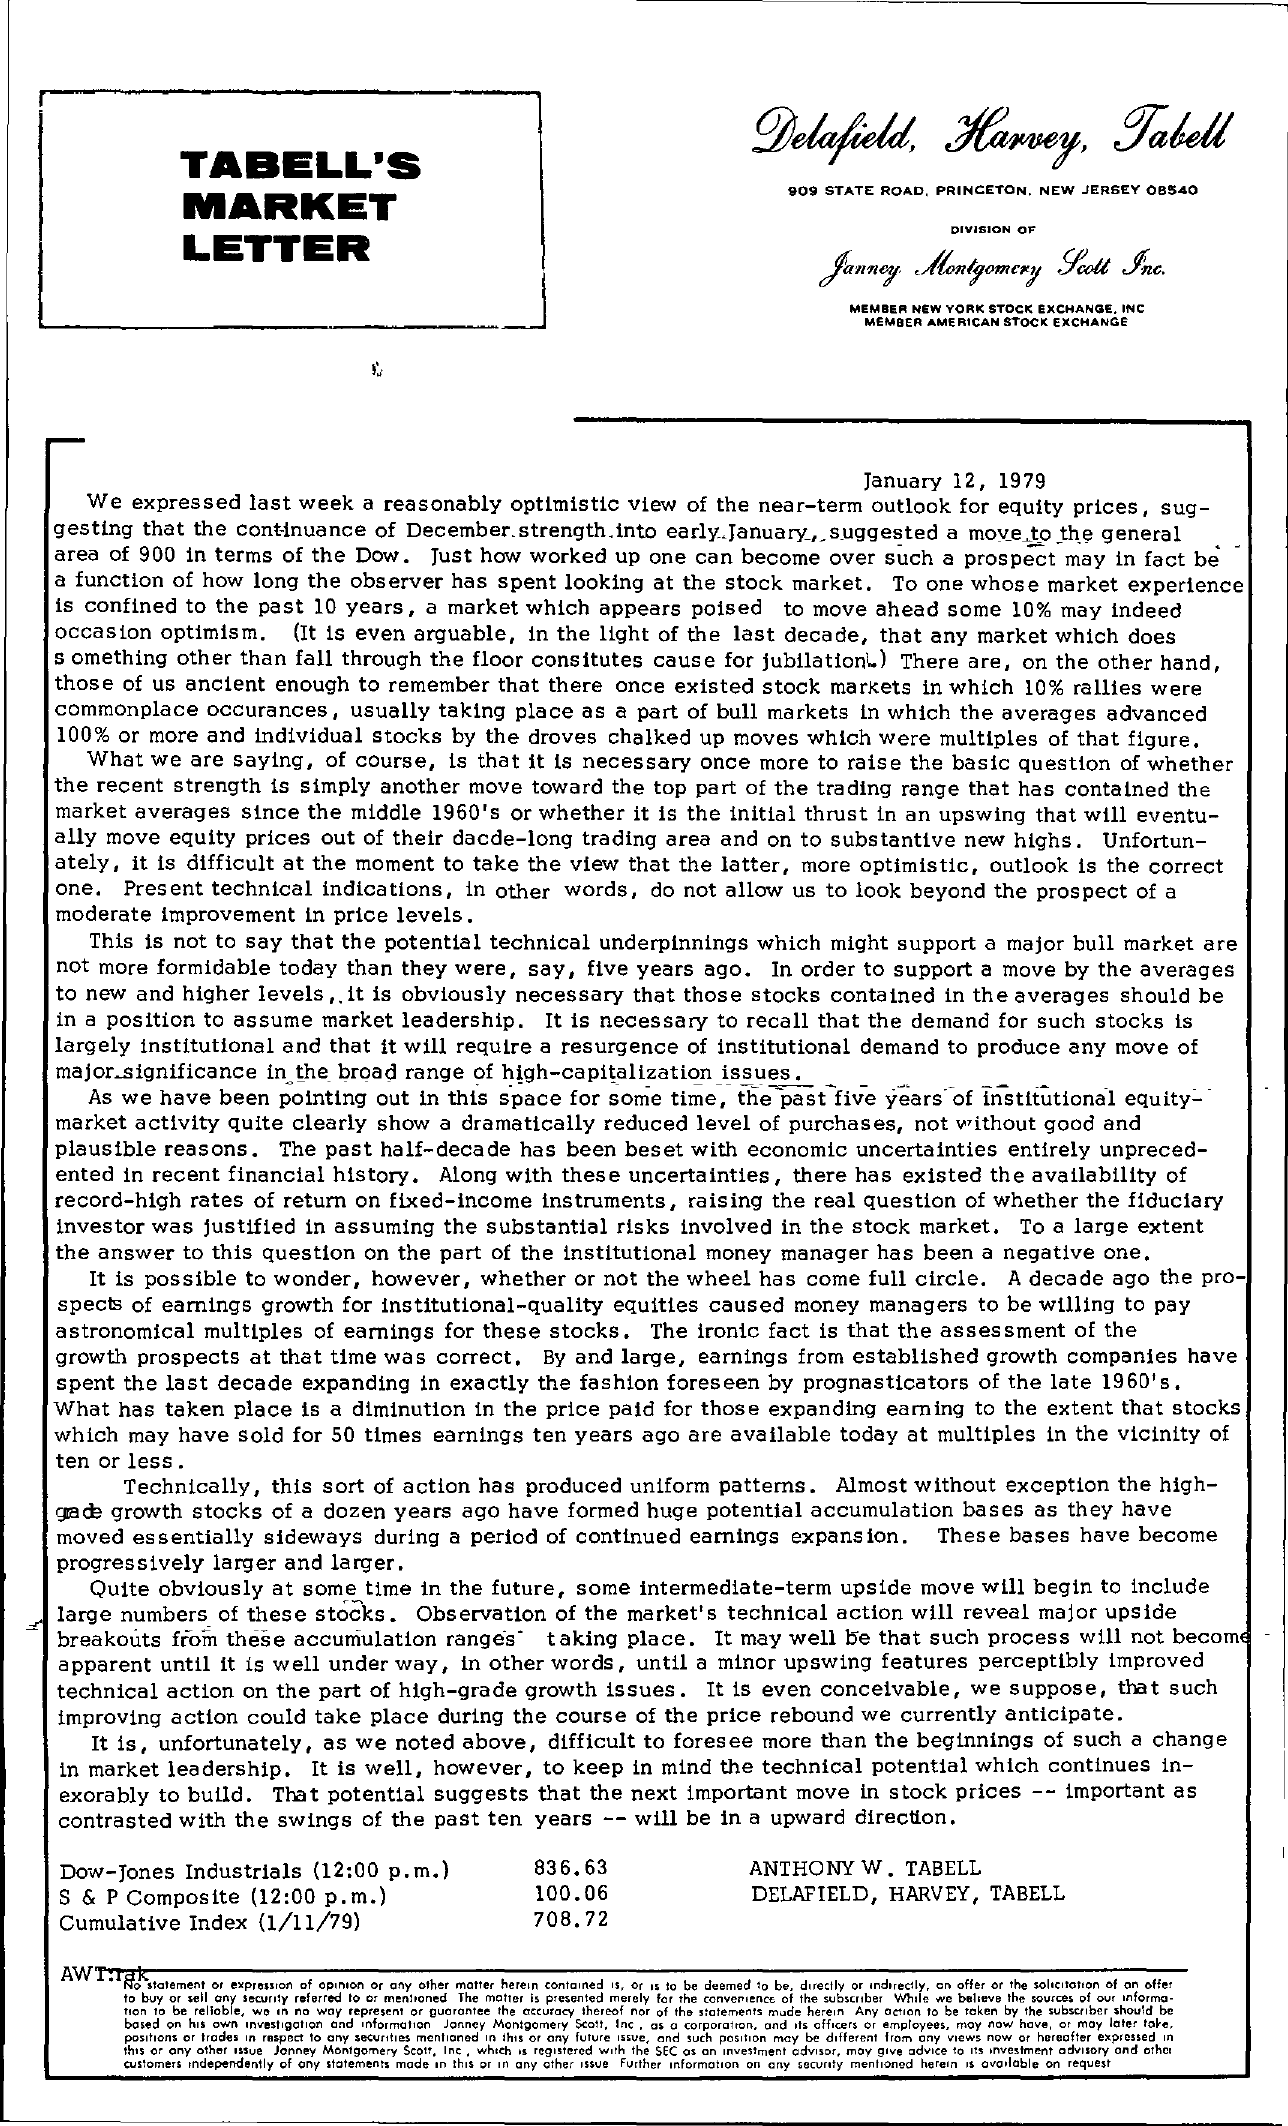 Tabell's Market Letter - January 12, 1979